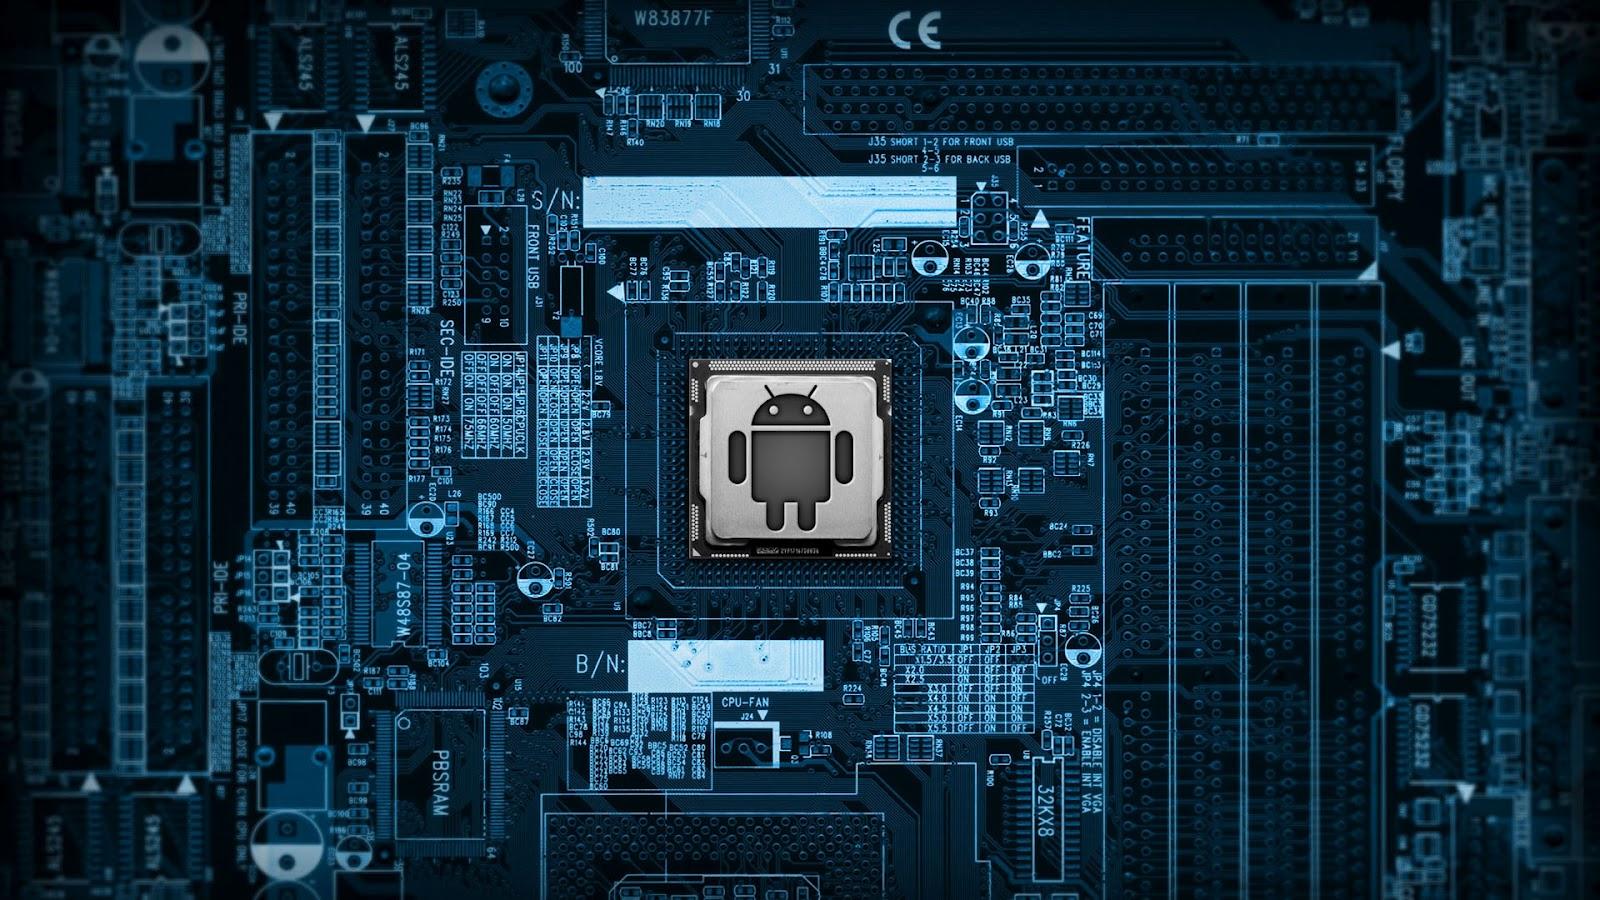 Unduh 4000 Wallpaper Android Tablet HD Paling Keren